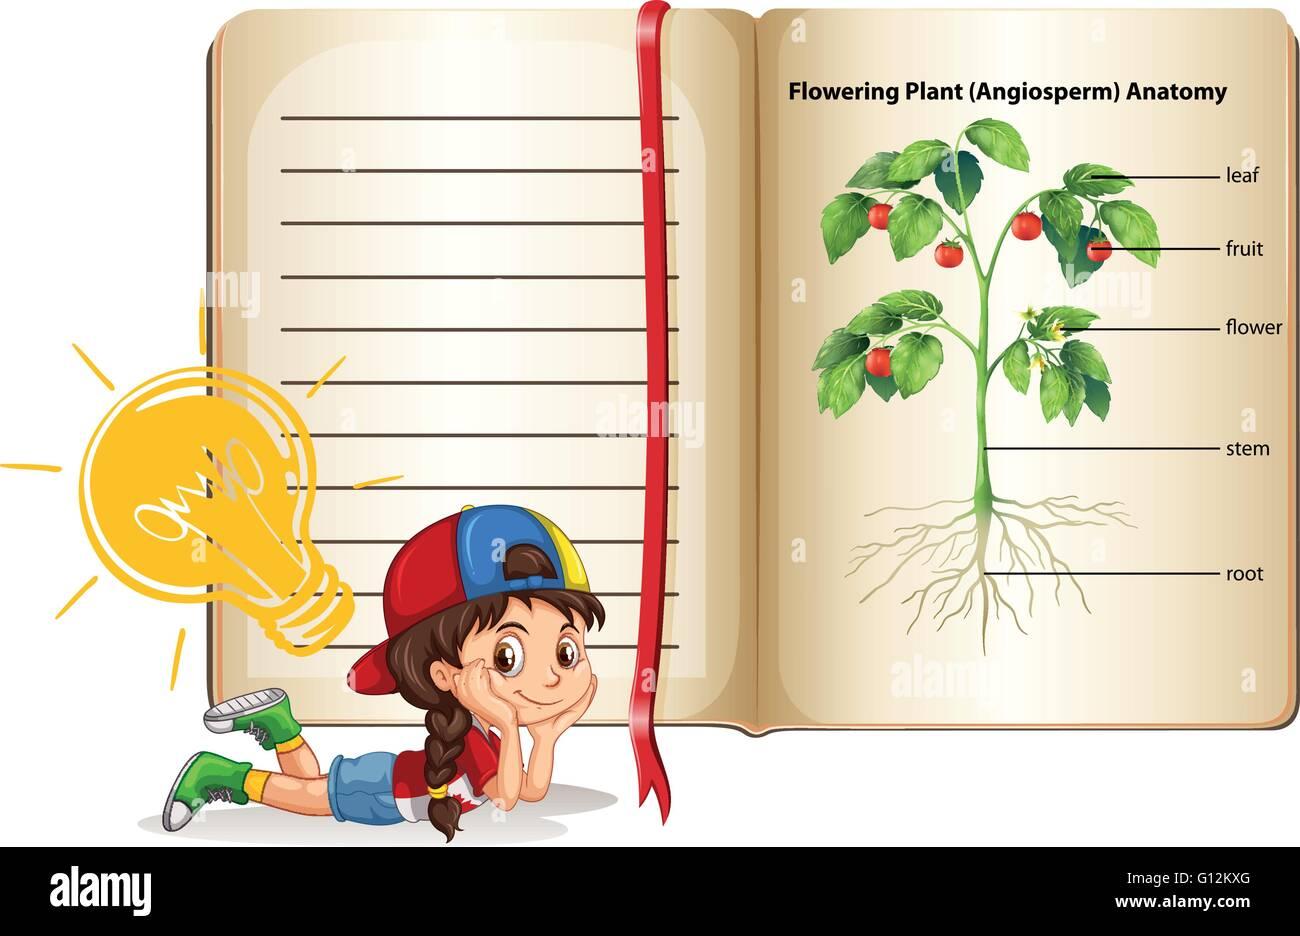 Girl and flowering plant anatomy illustration Stock Vector Art ...